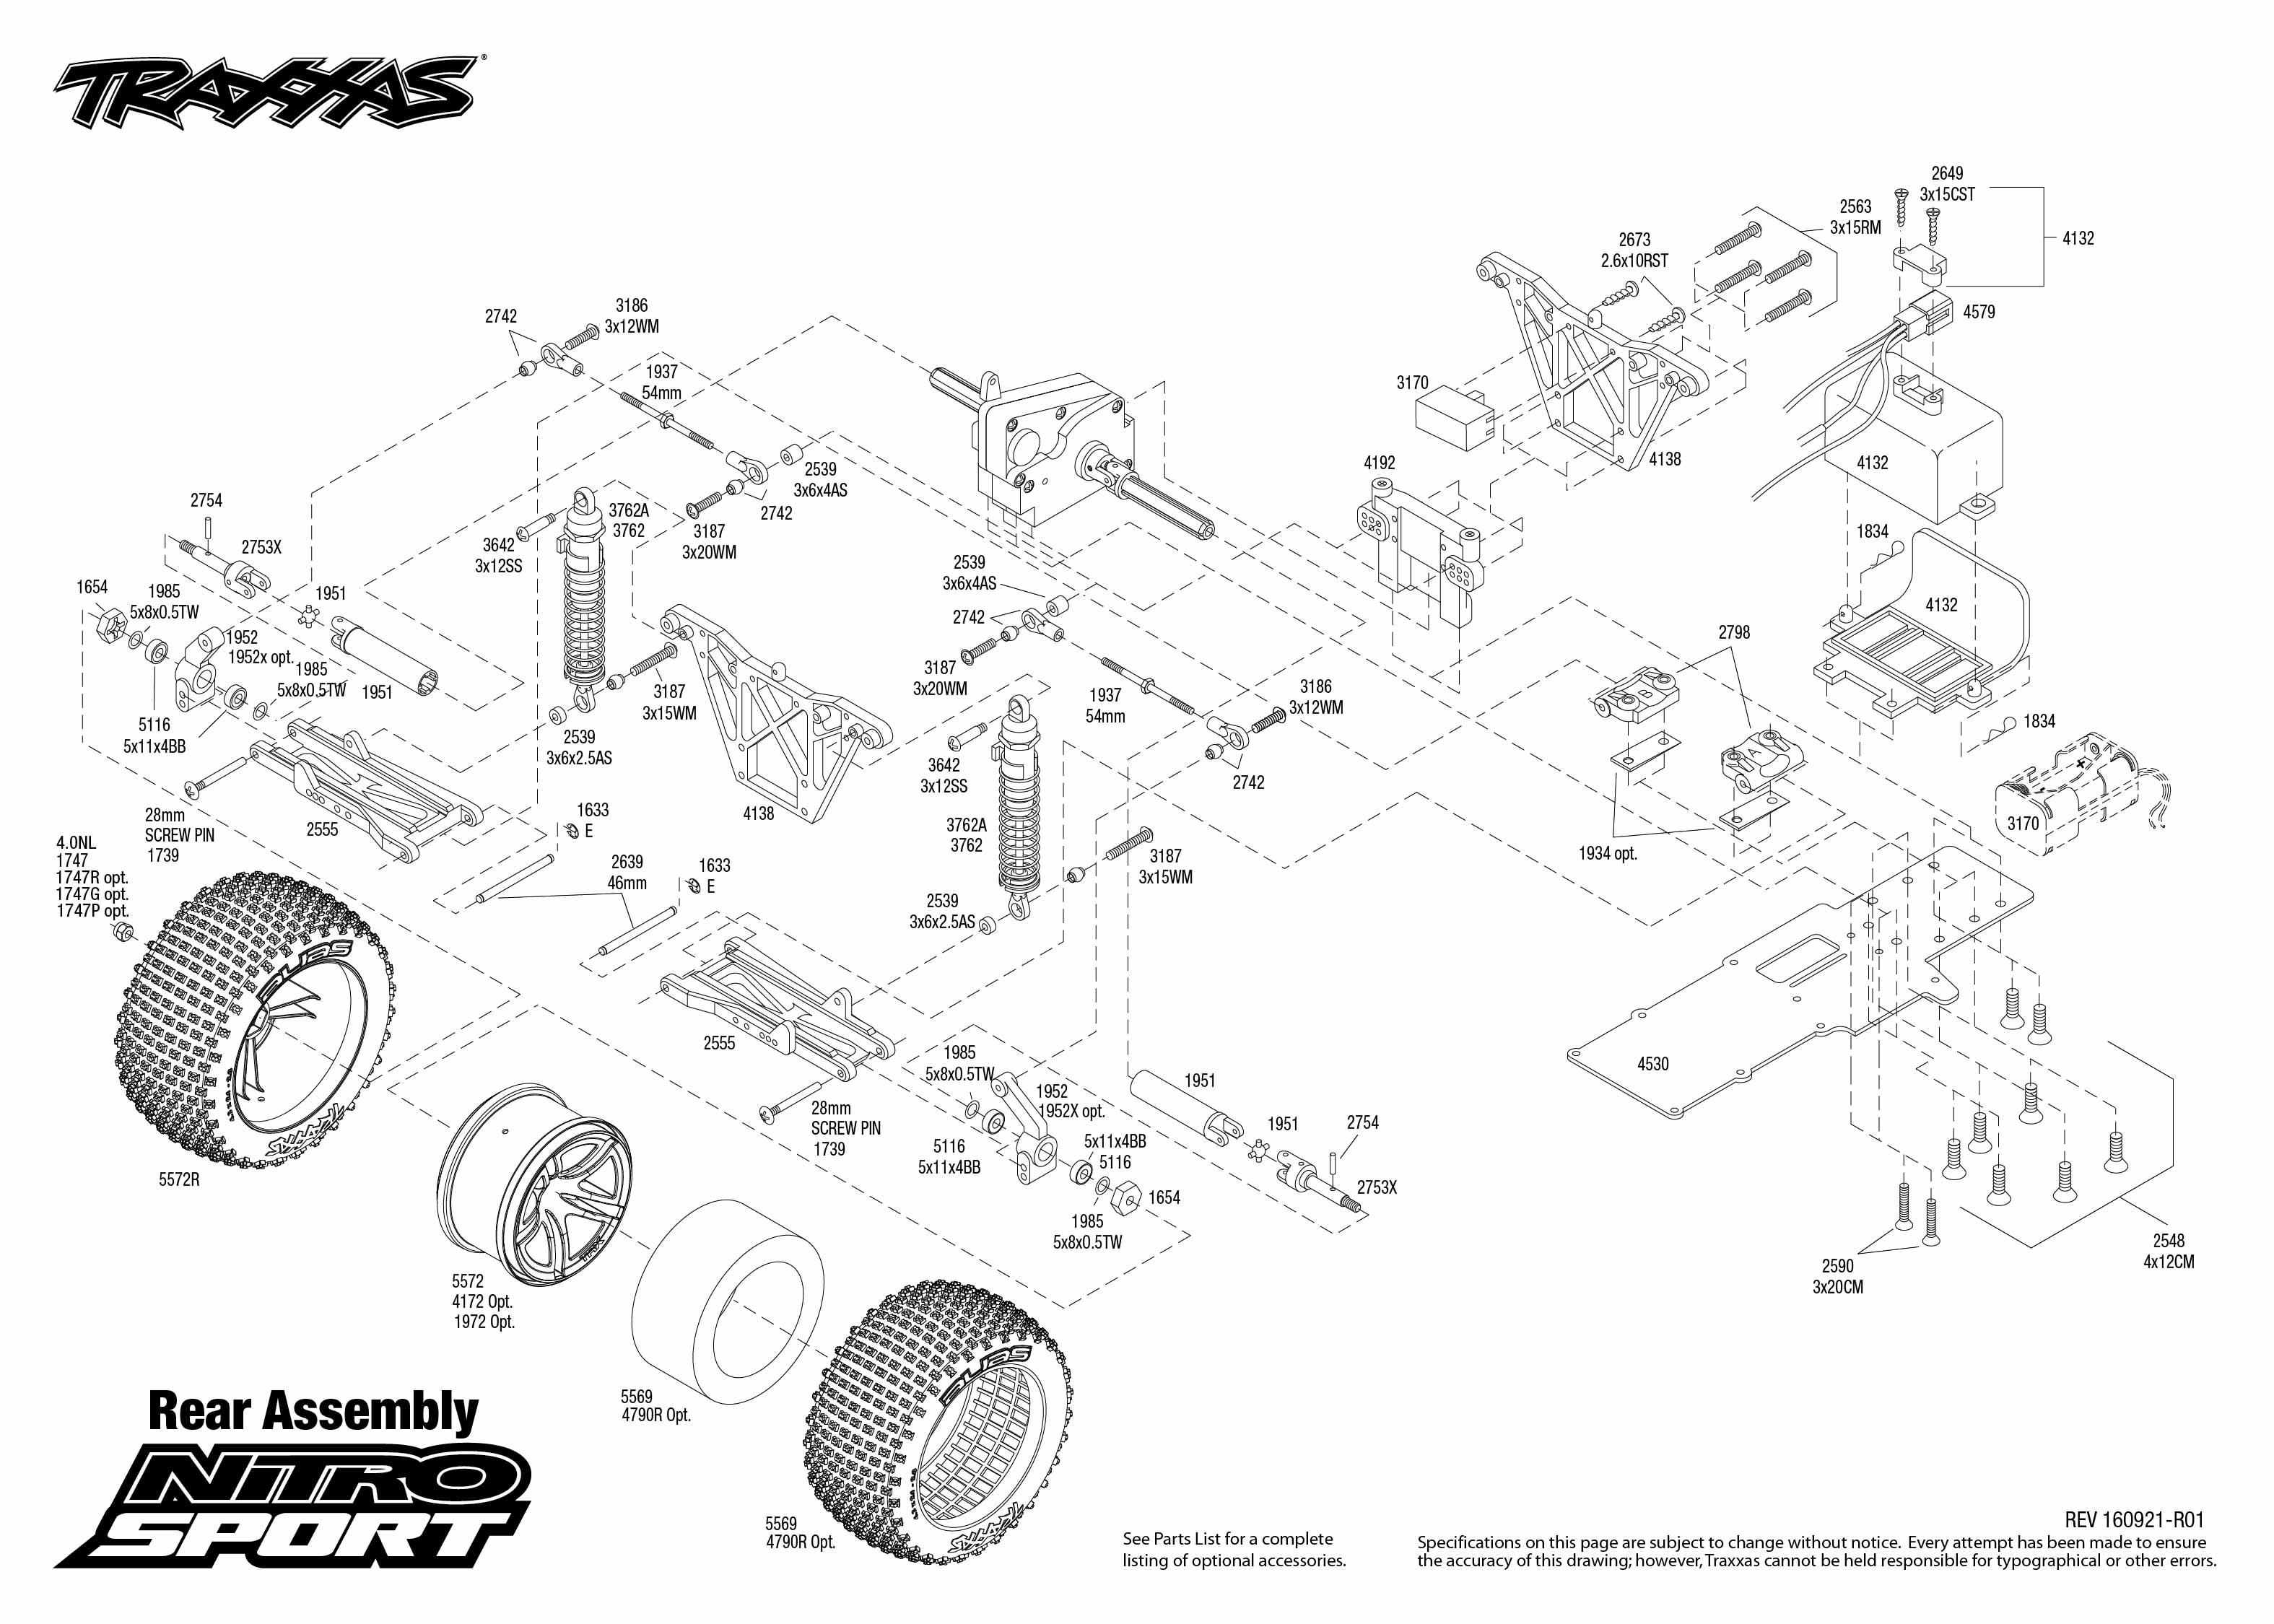 Nitro Sport 1 Rear Assembly Exploded View